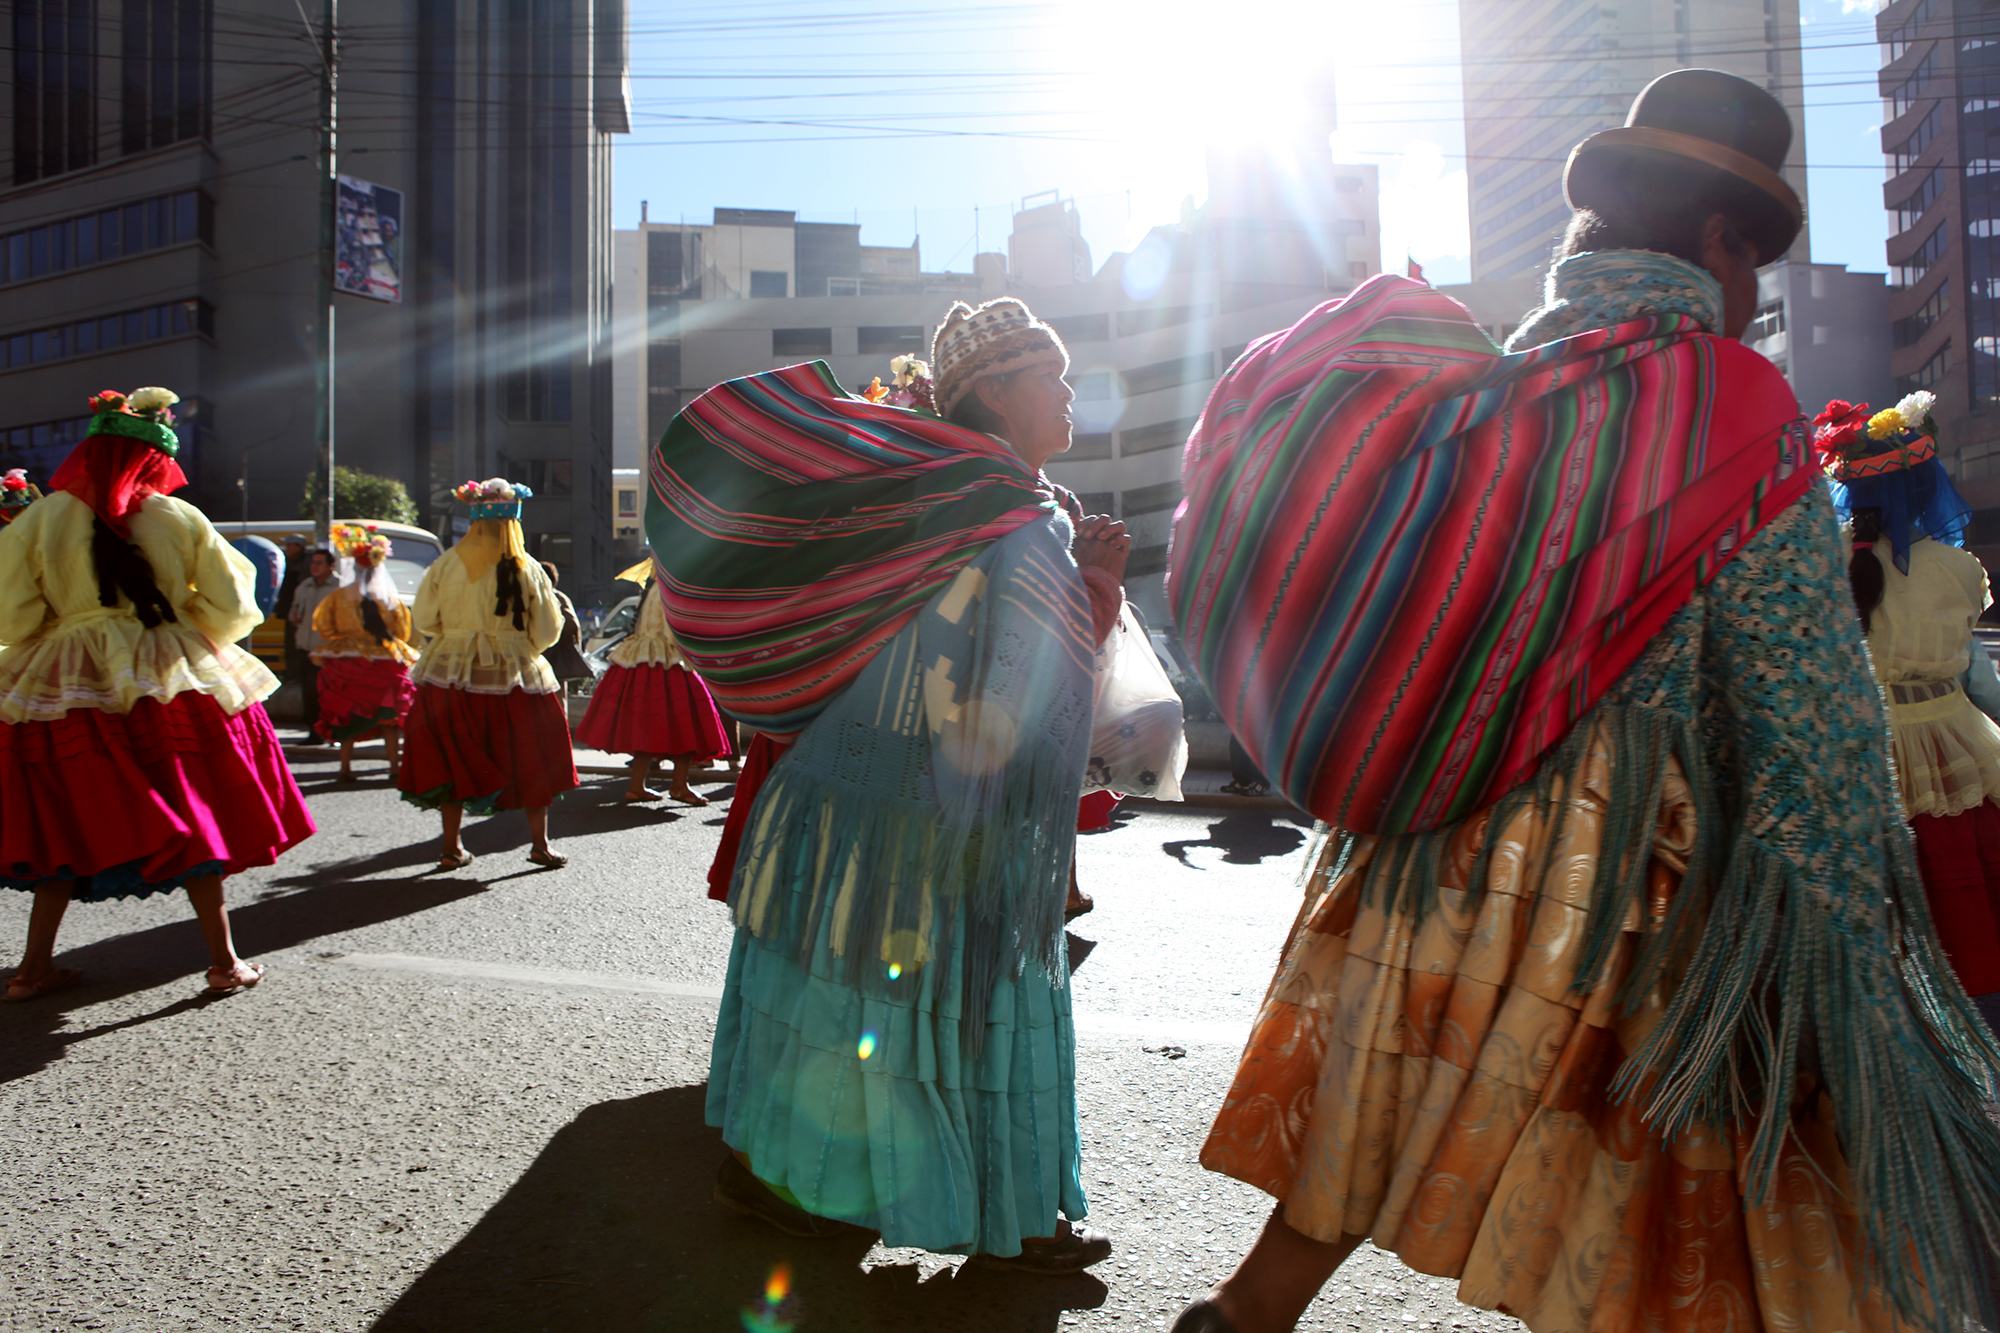 Part parade, part daily life in La Paz, Bolivia.